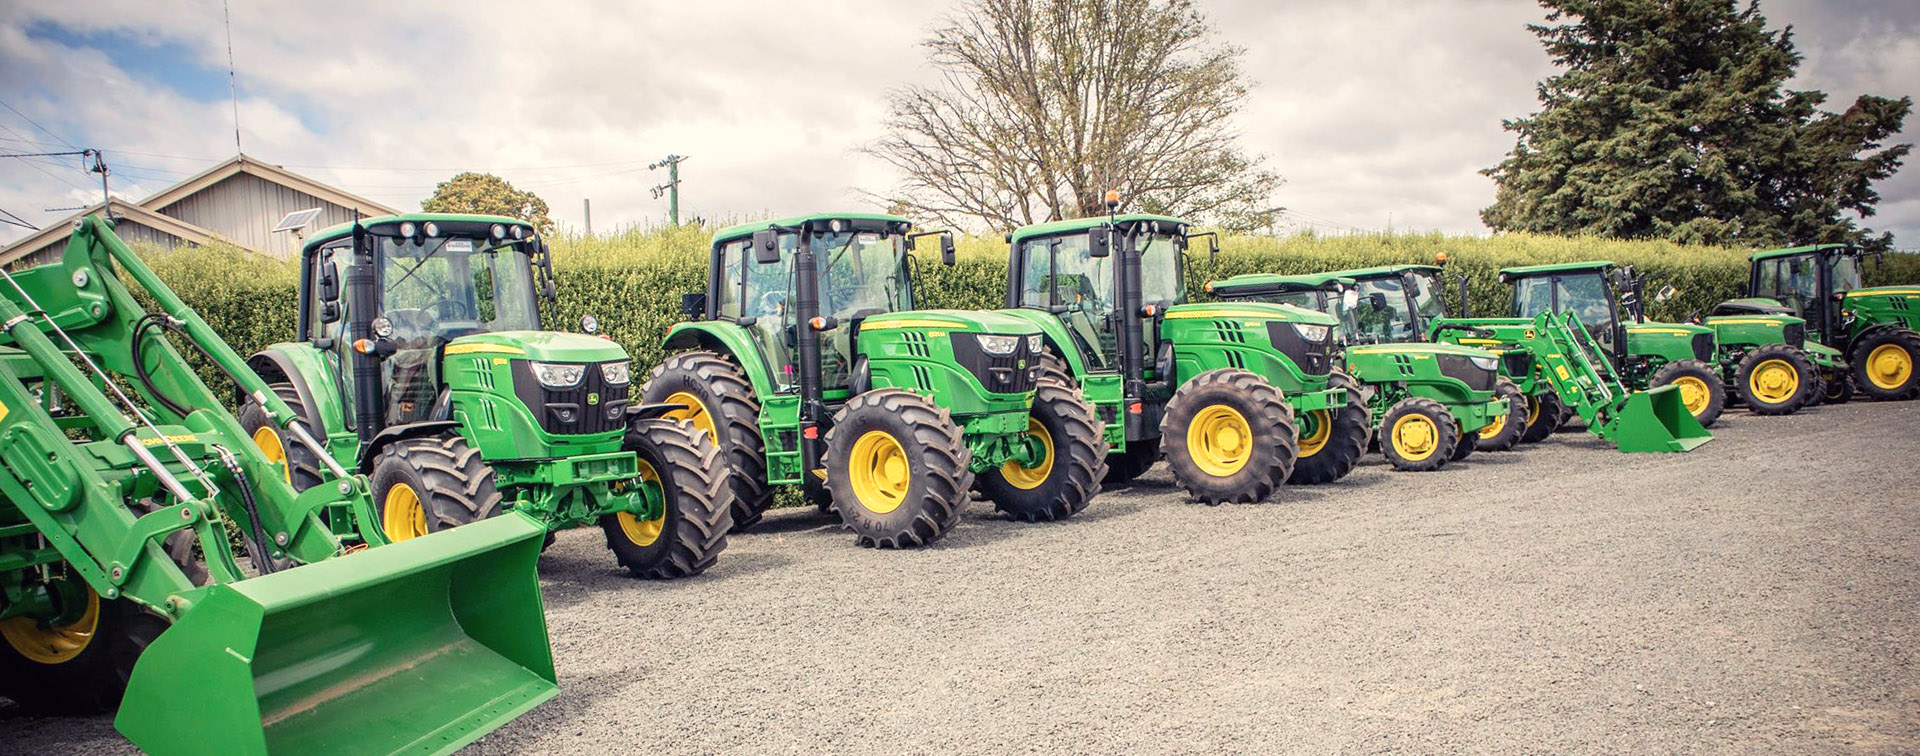 Midland Tractors – New & Used Tractors & Farm Equipment